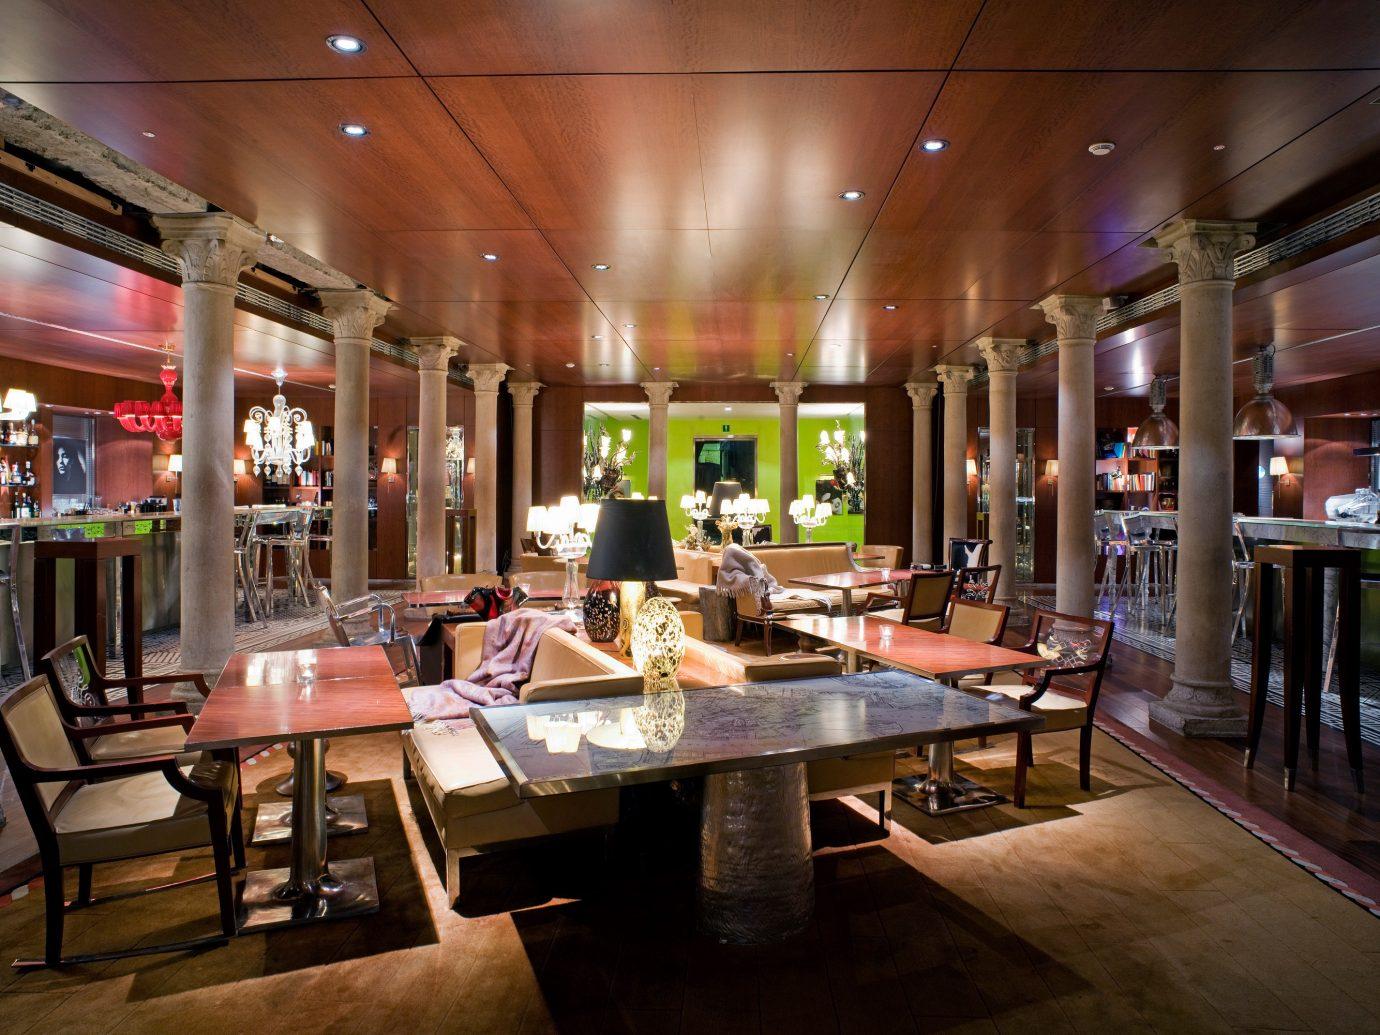 Bar City Dining Hip Hotels Italy Luxury Luxury Travel Venice indoor ceiling table floor restaurant meal Lobby interior design café several